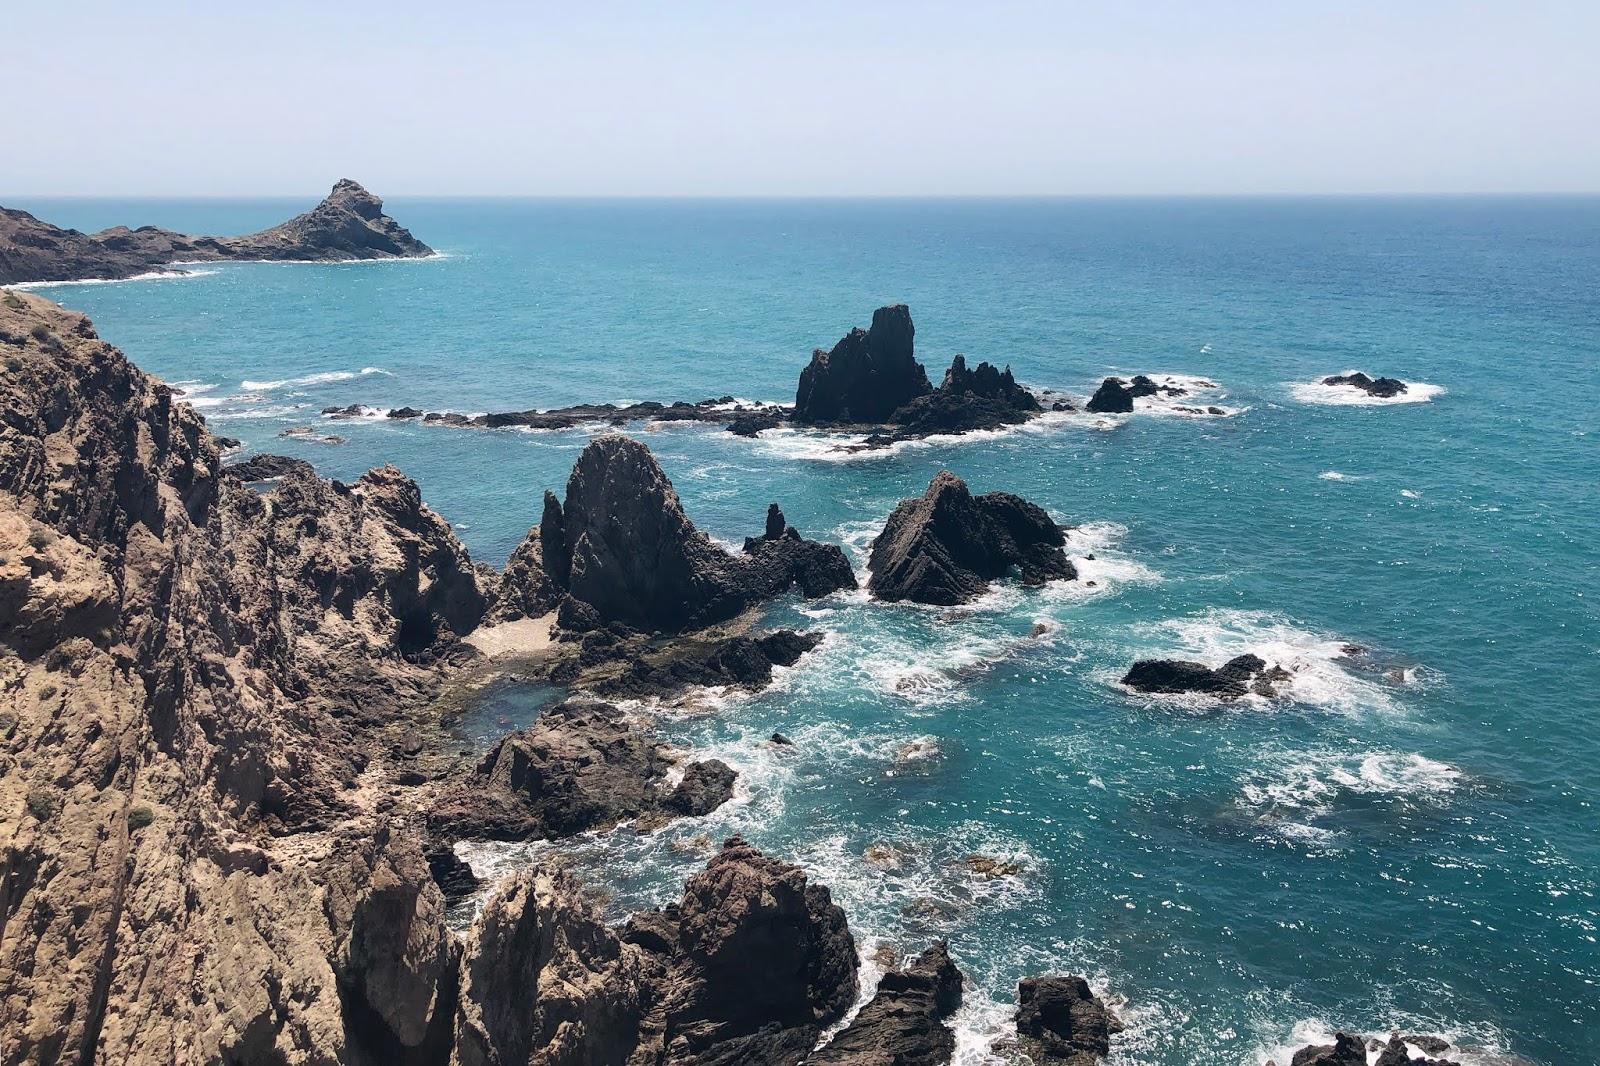 Where the sea meets the jagged coastline